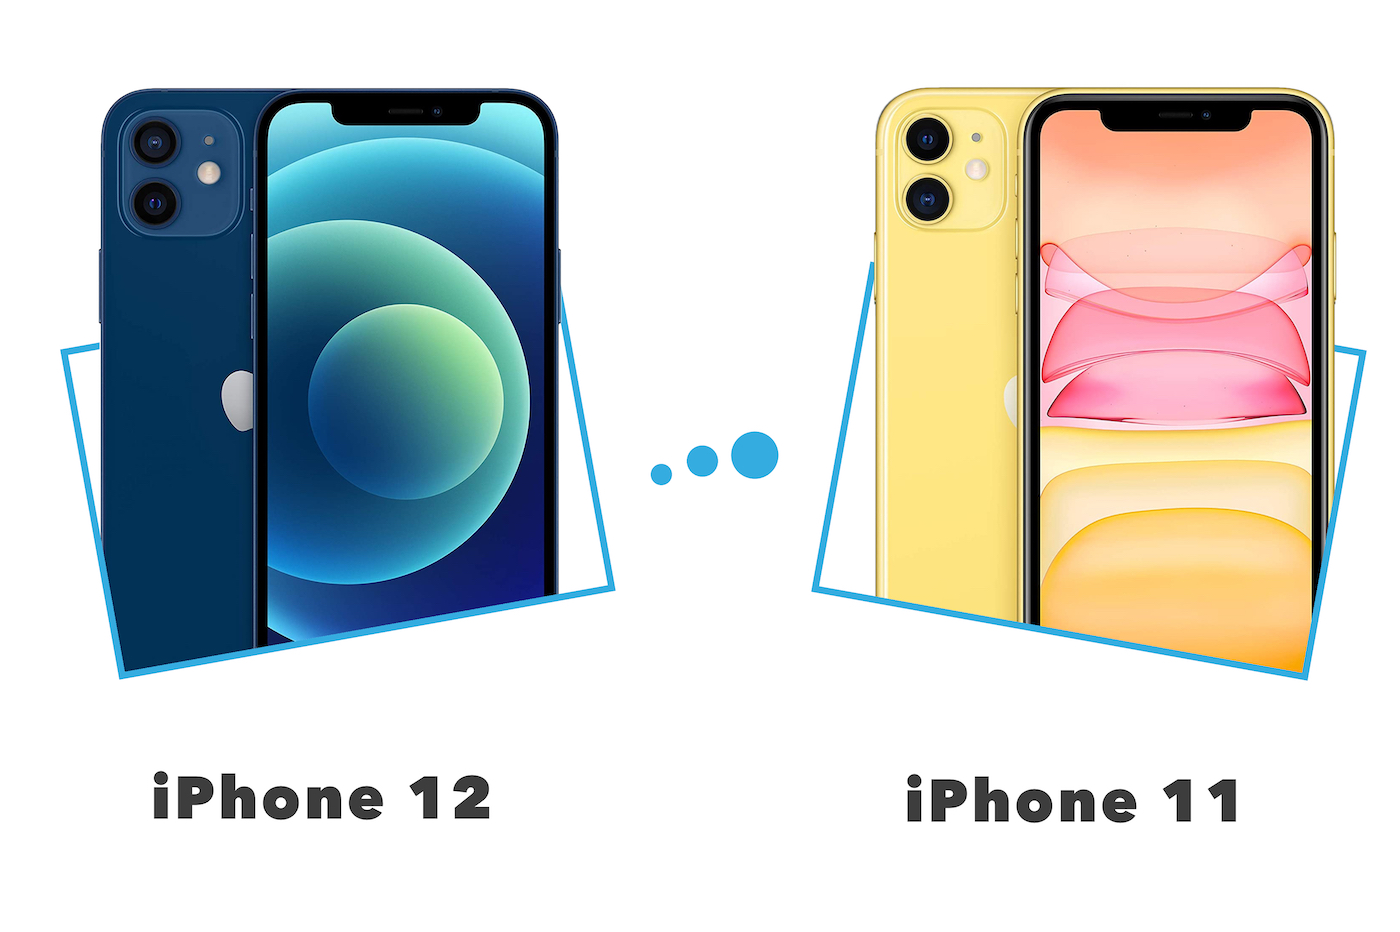 iPhone 12 vs iPhone 11